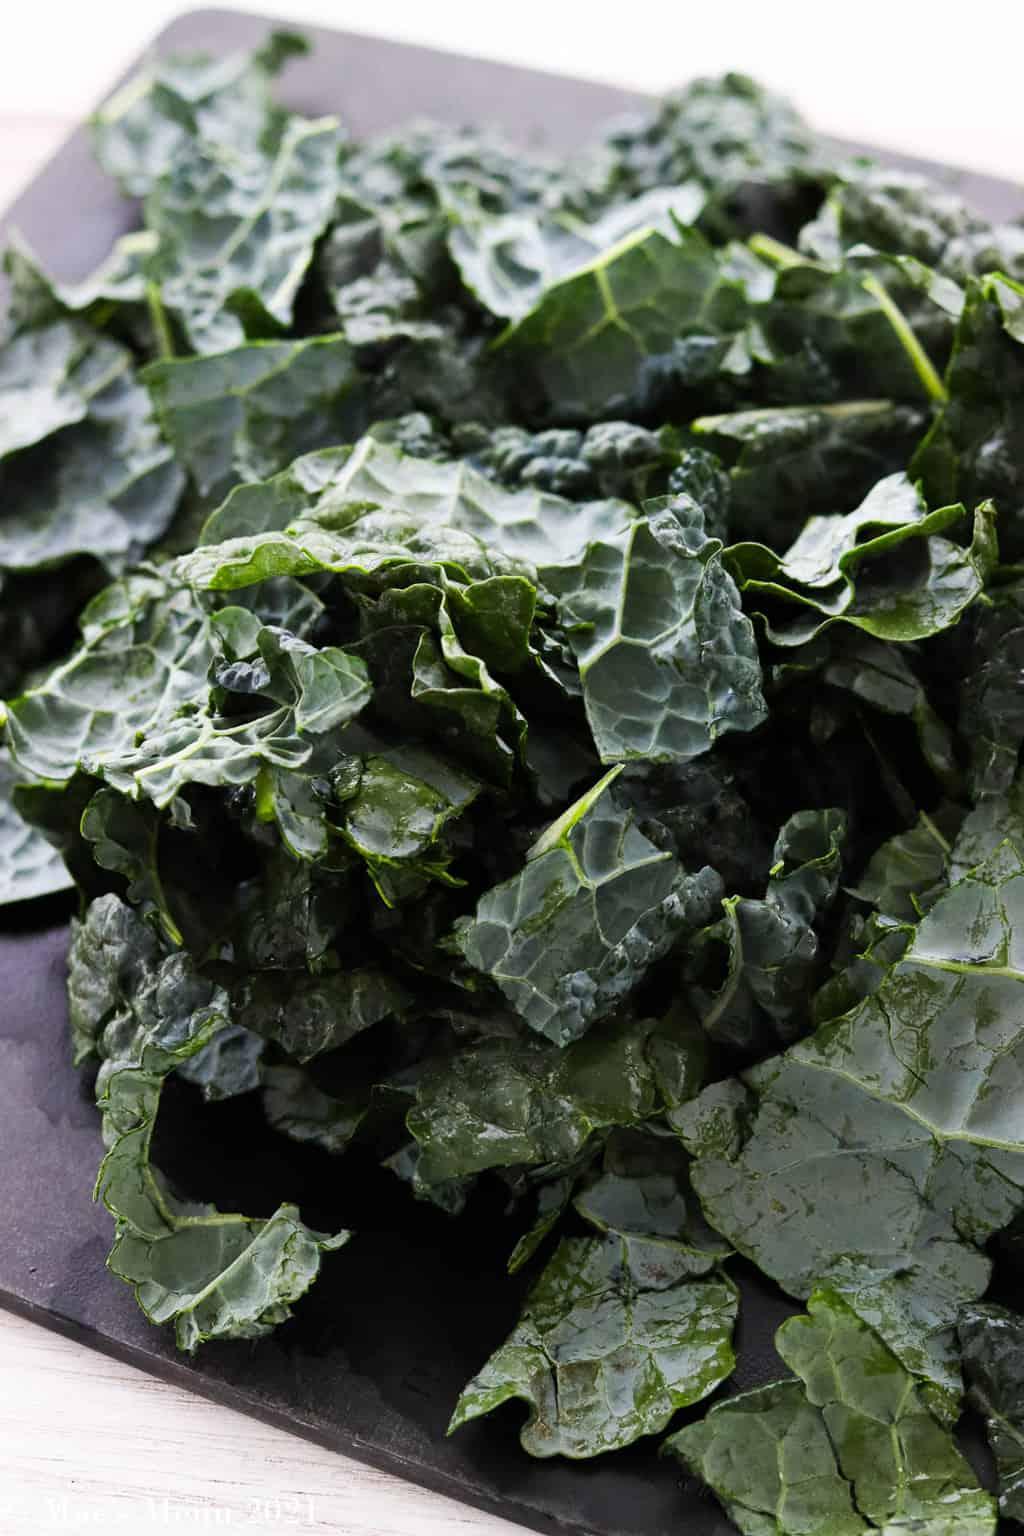 A cutting board full of chopped lacinato kale